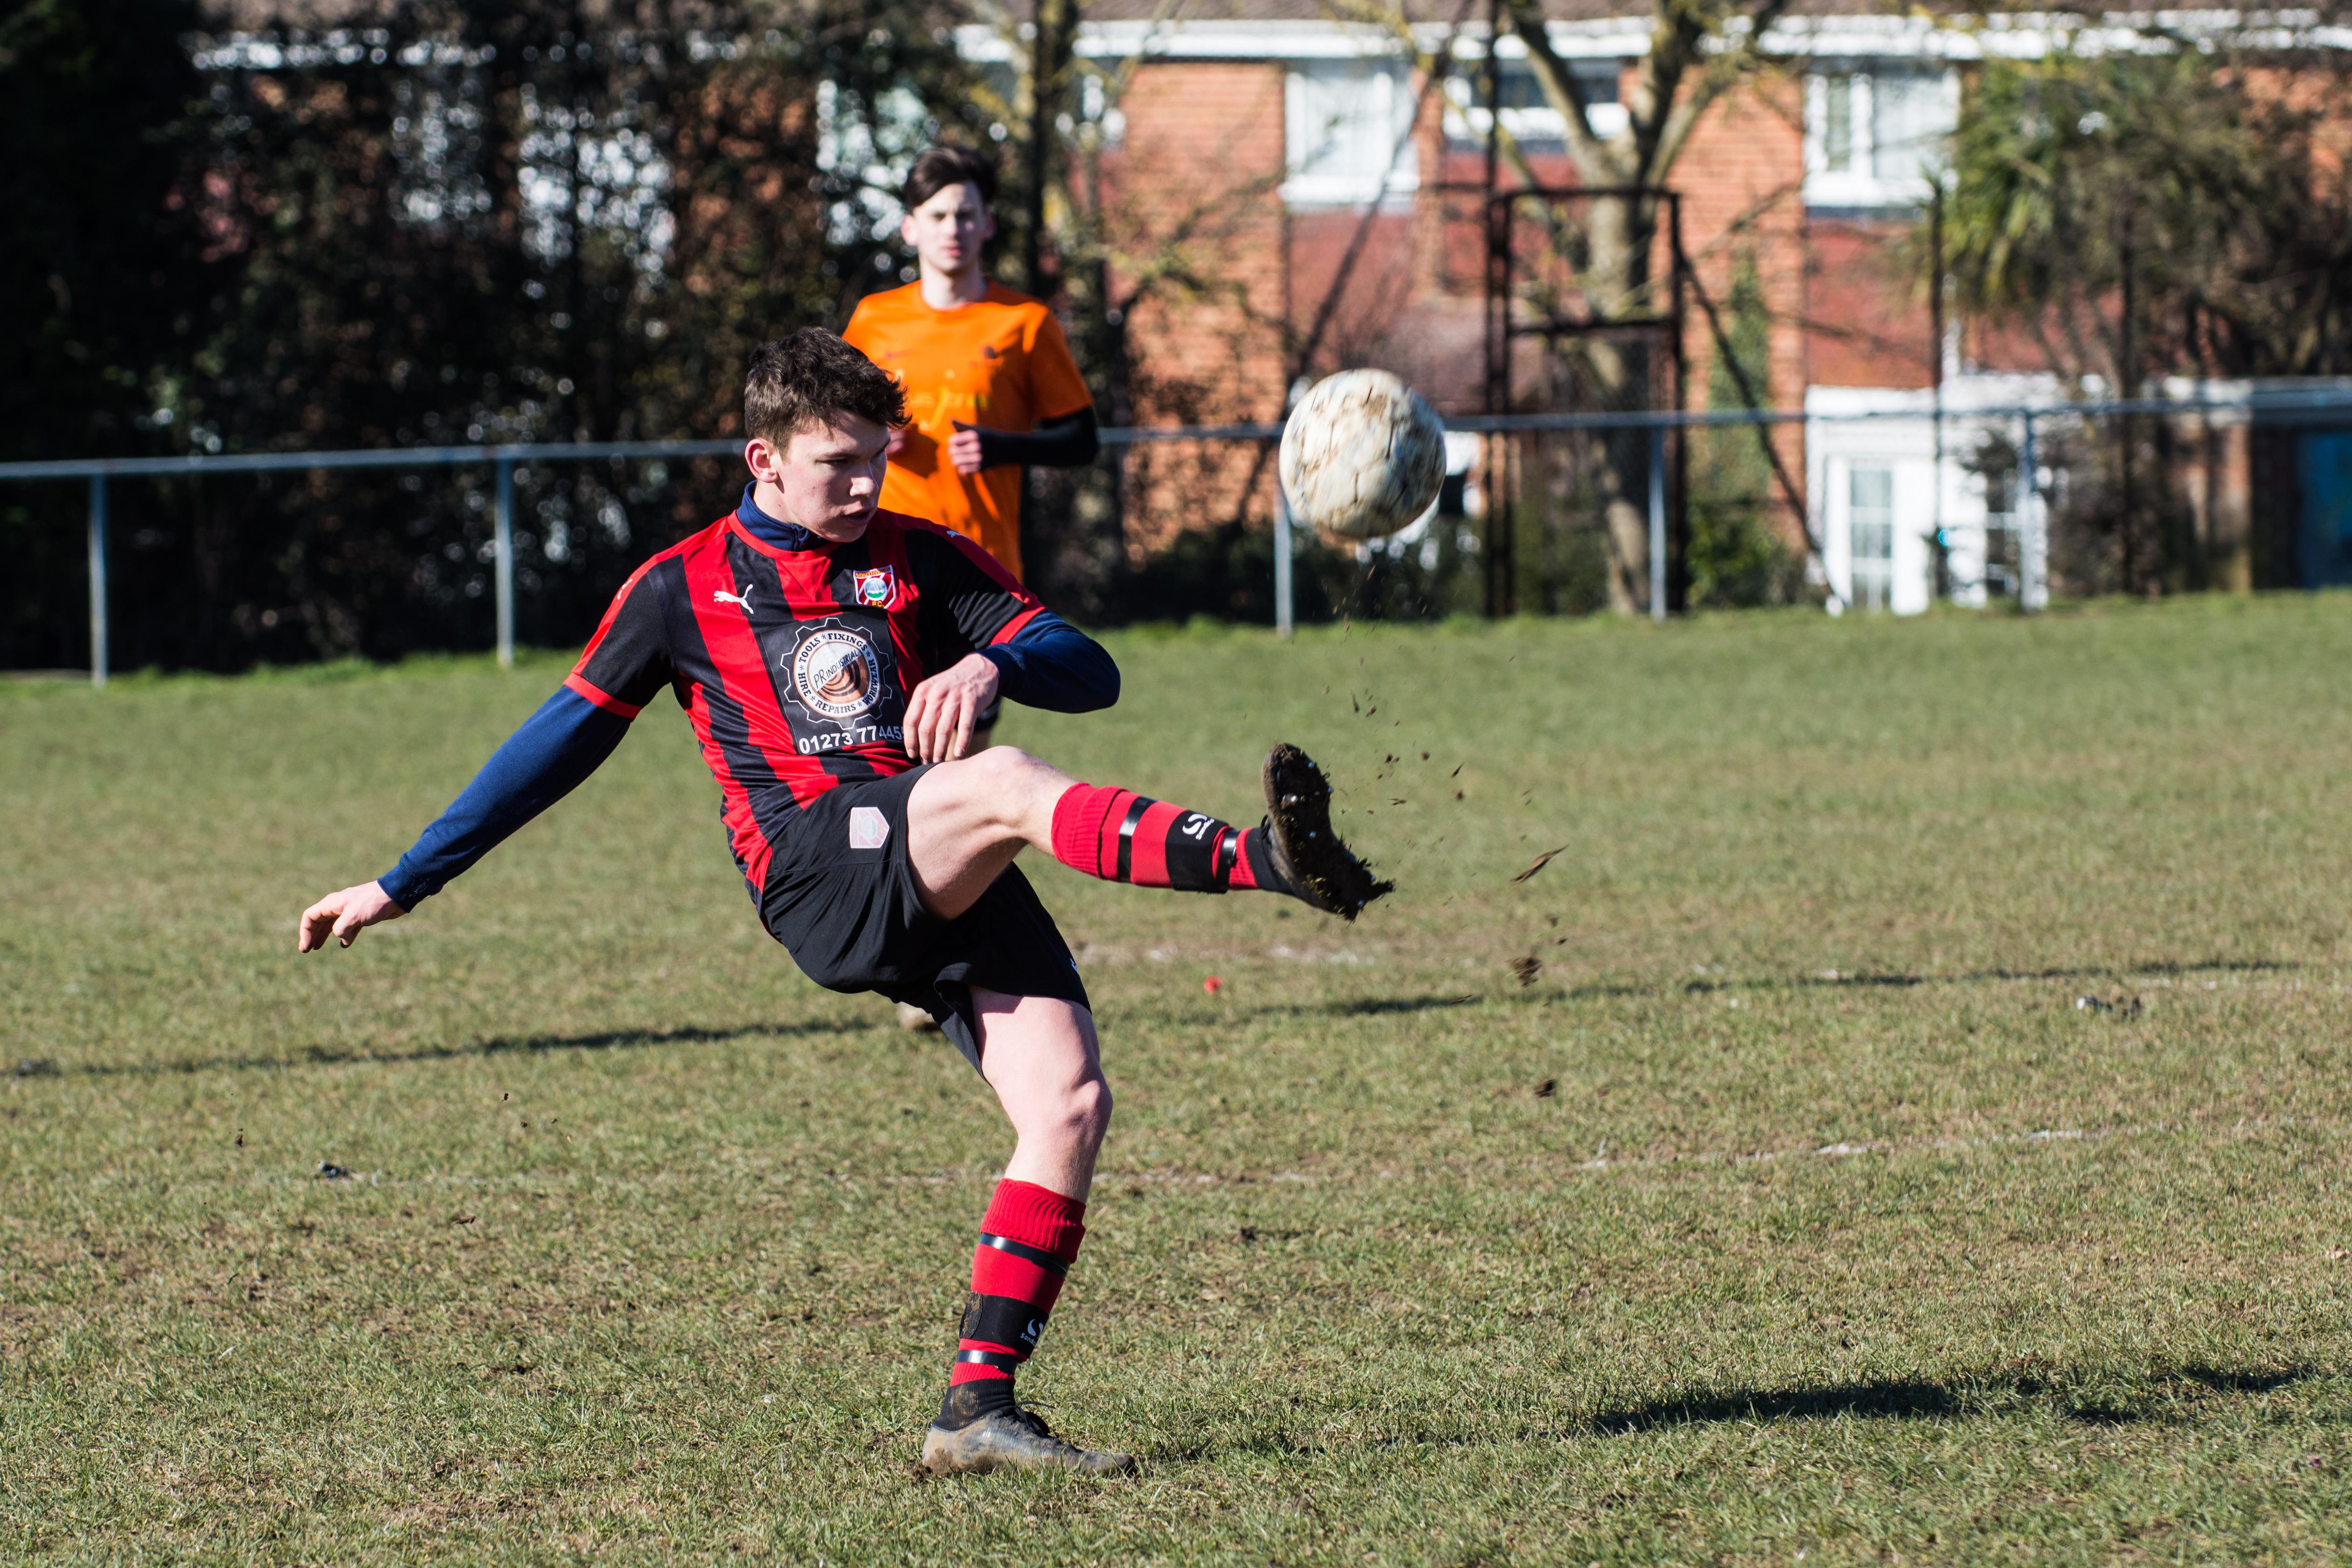 Mile Oak FC U18s vs Southwick FC U18s 25.02.18 08 DAVID_JEFFERY